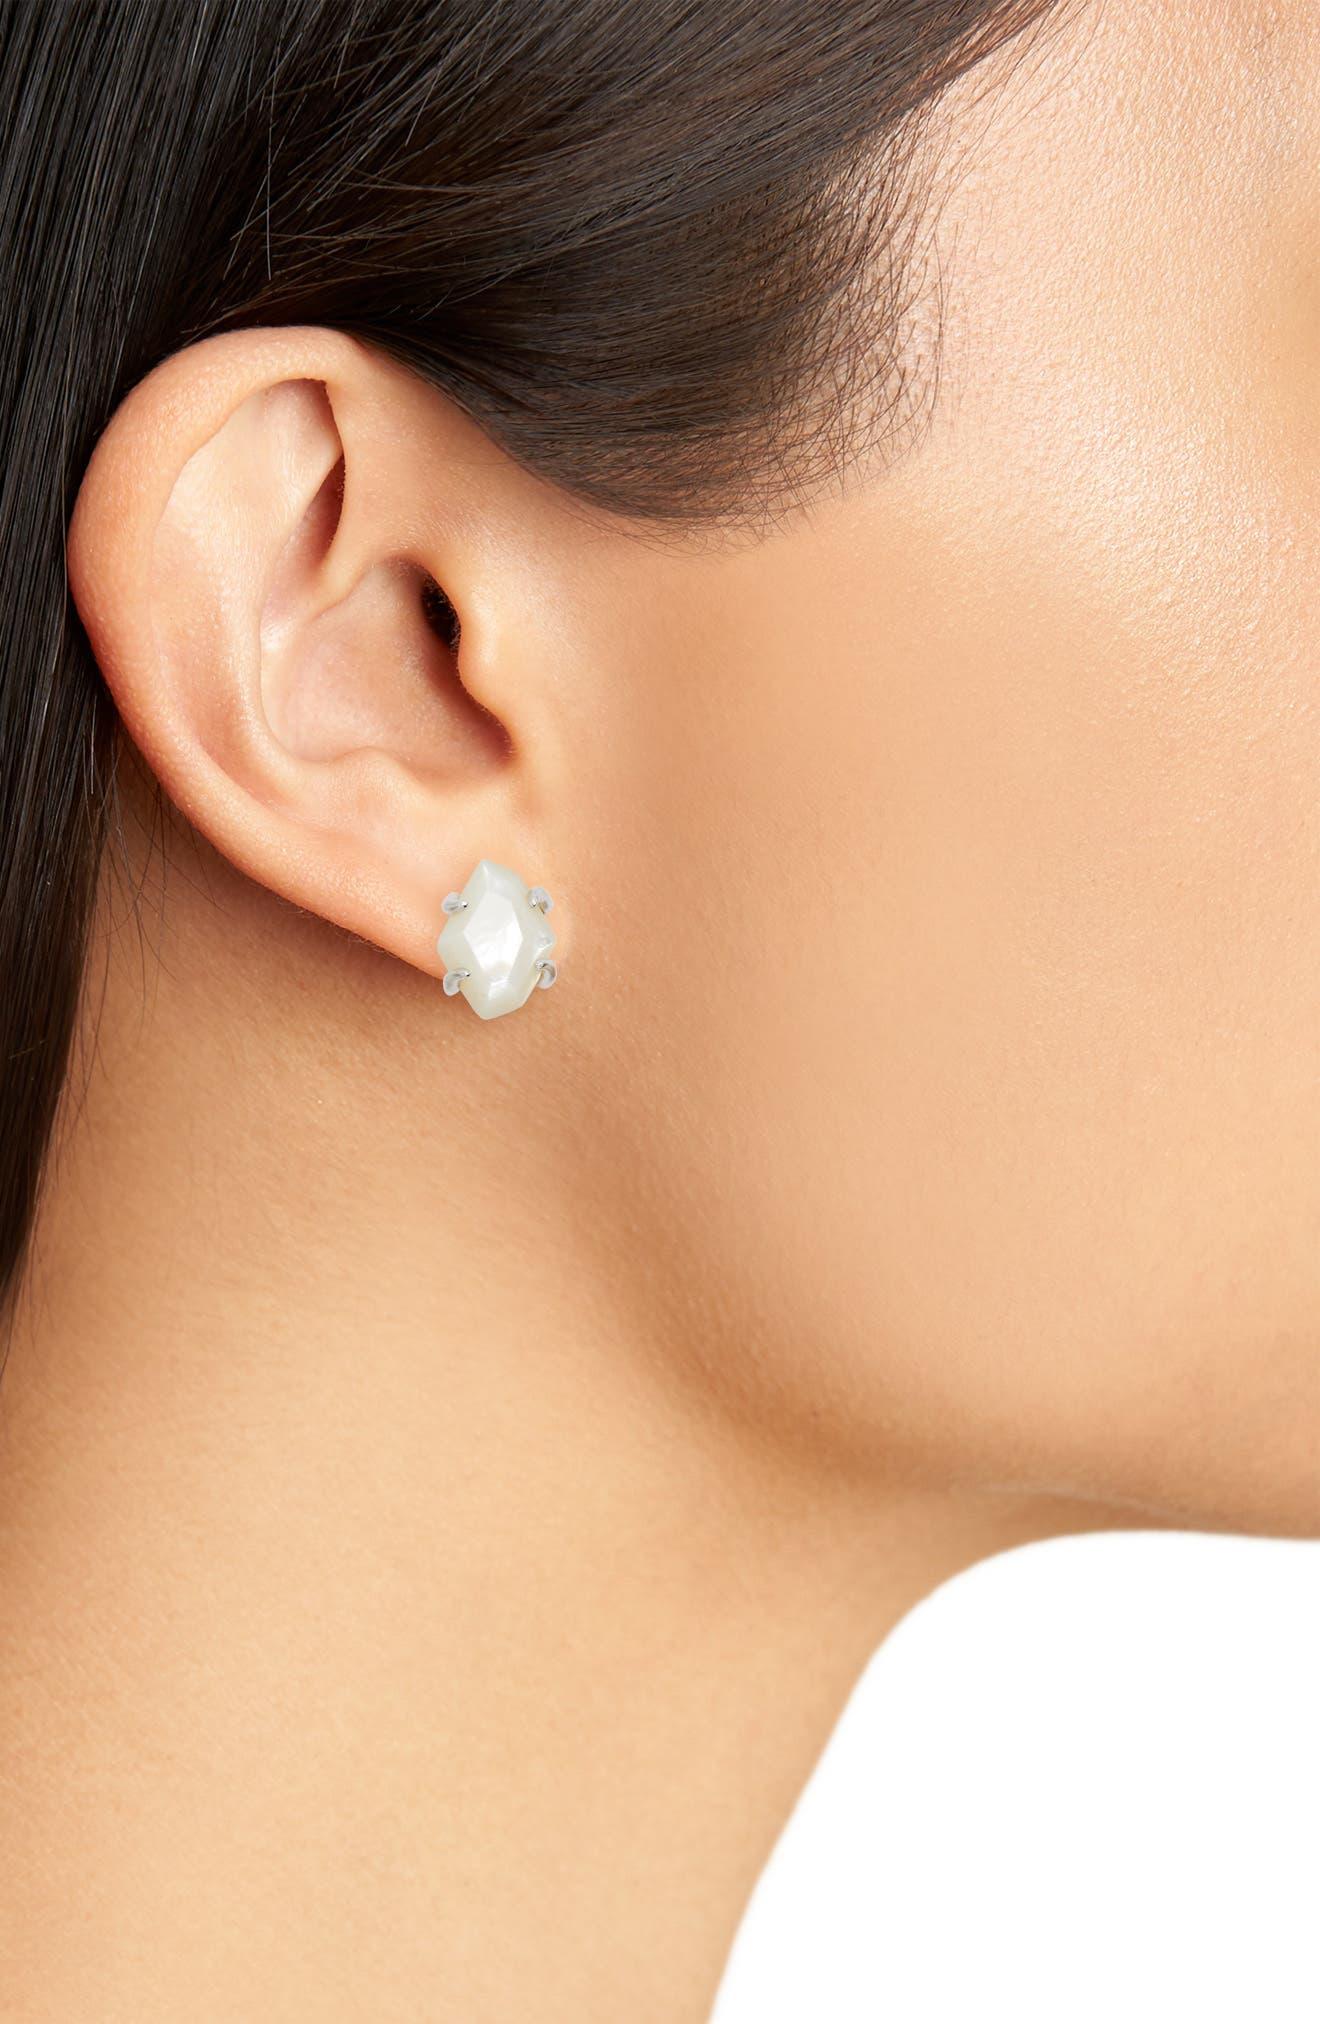 Inaiyah Stud Earrings,                             Alternate thumbnail 2, color,                             100